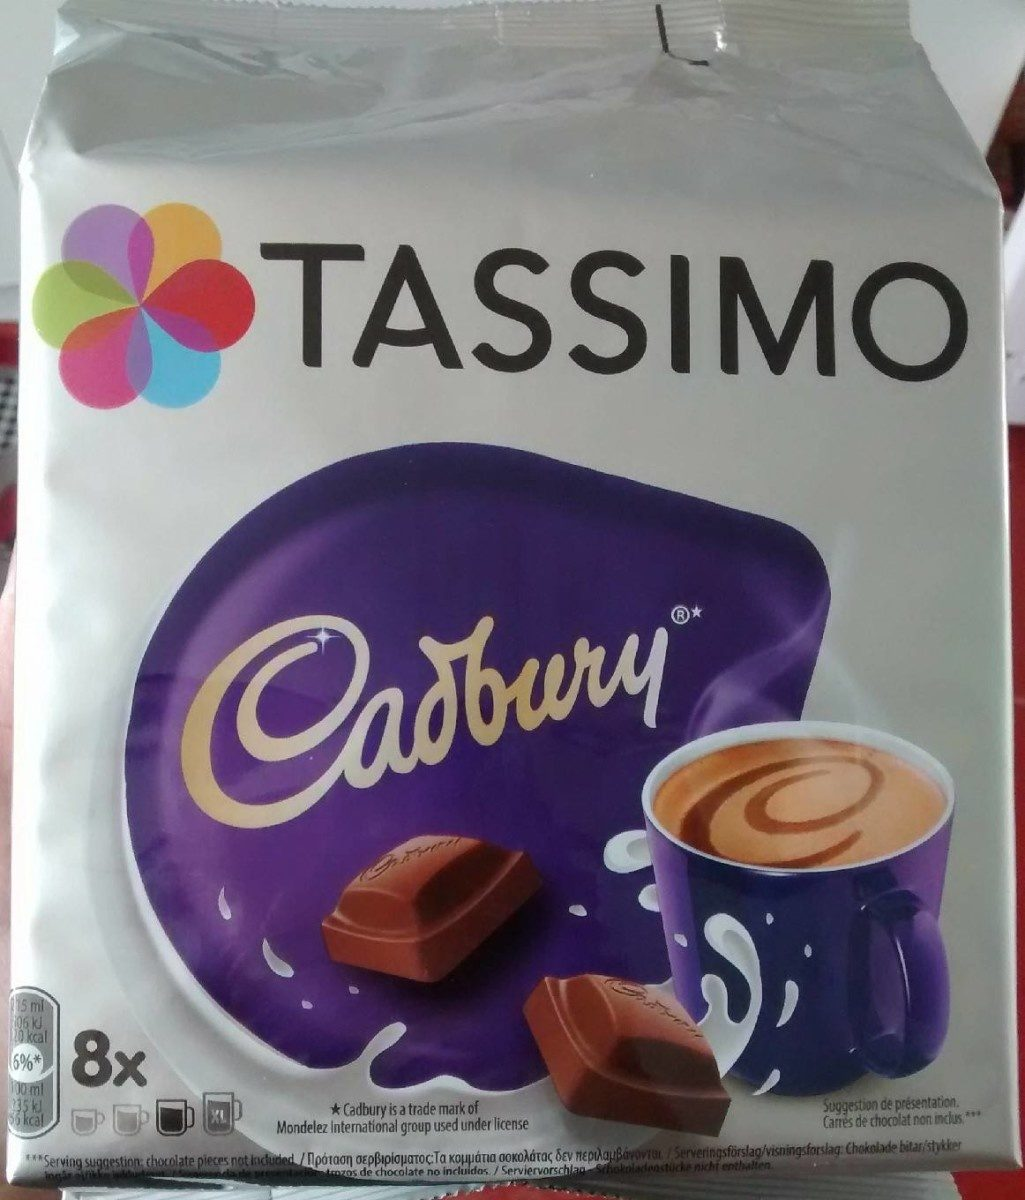 Tassimo Cadbury Hot Chocolate Pods X8